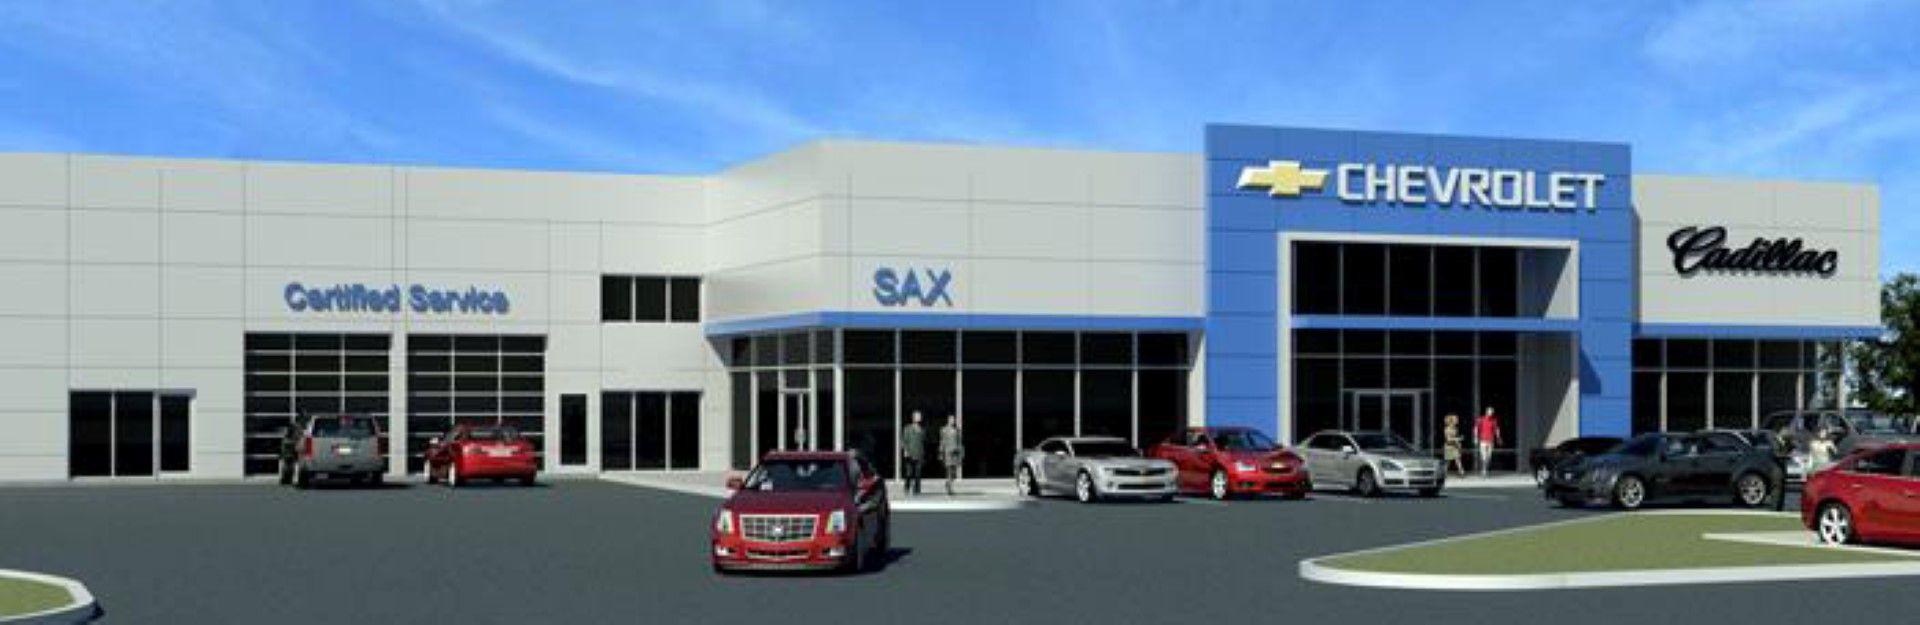 Car Dealerships In Dickinson Nd >> Car Dealerships Sax Motors Dickinson Nd General